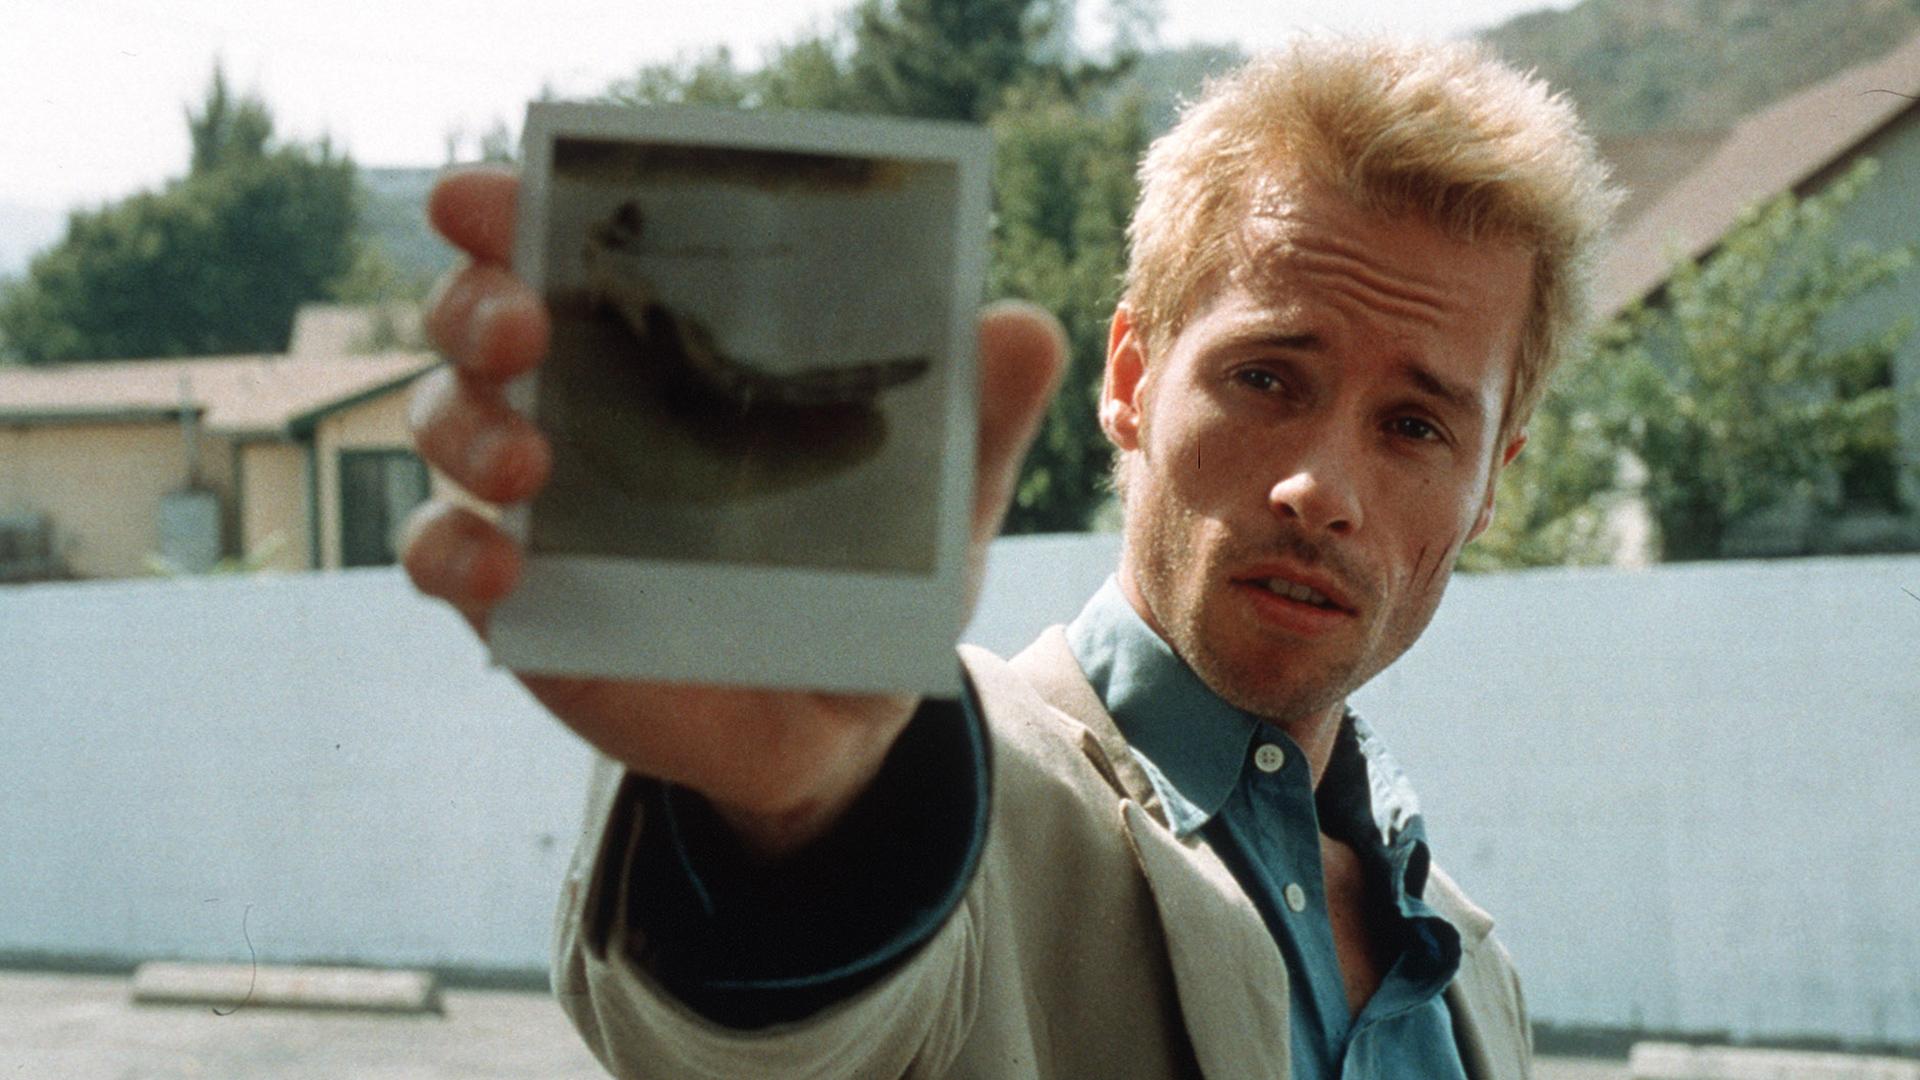 Memento: Guy Pearce